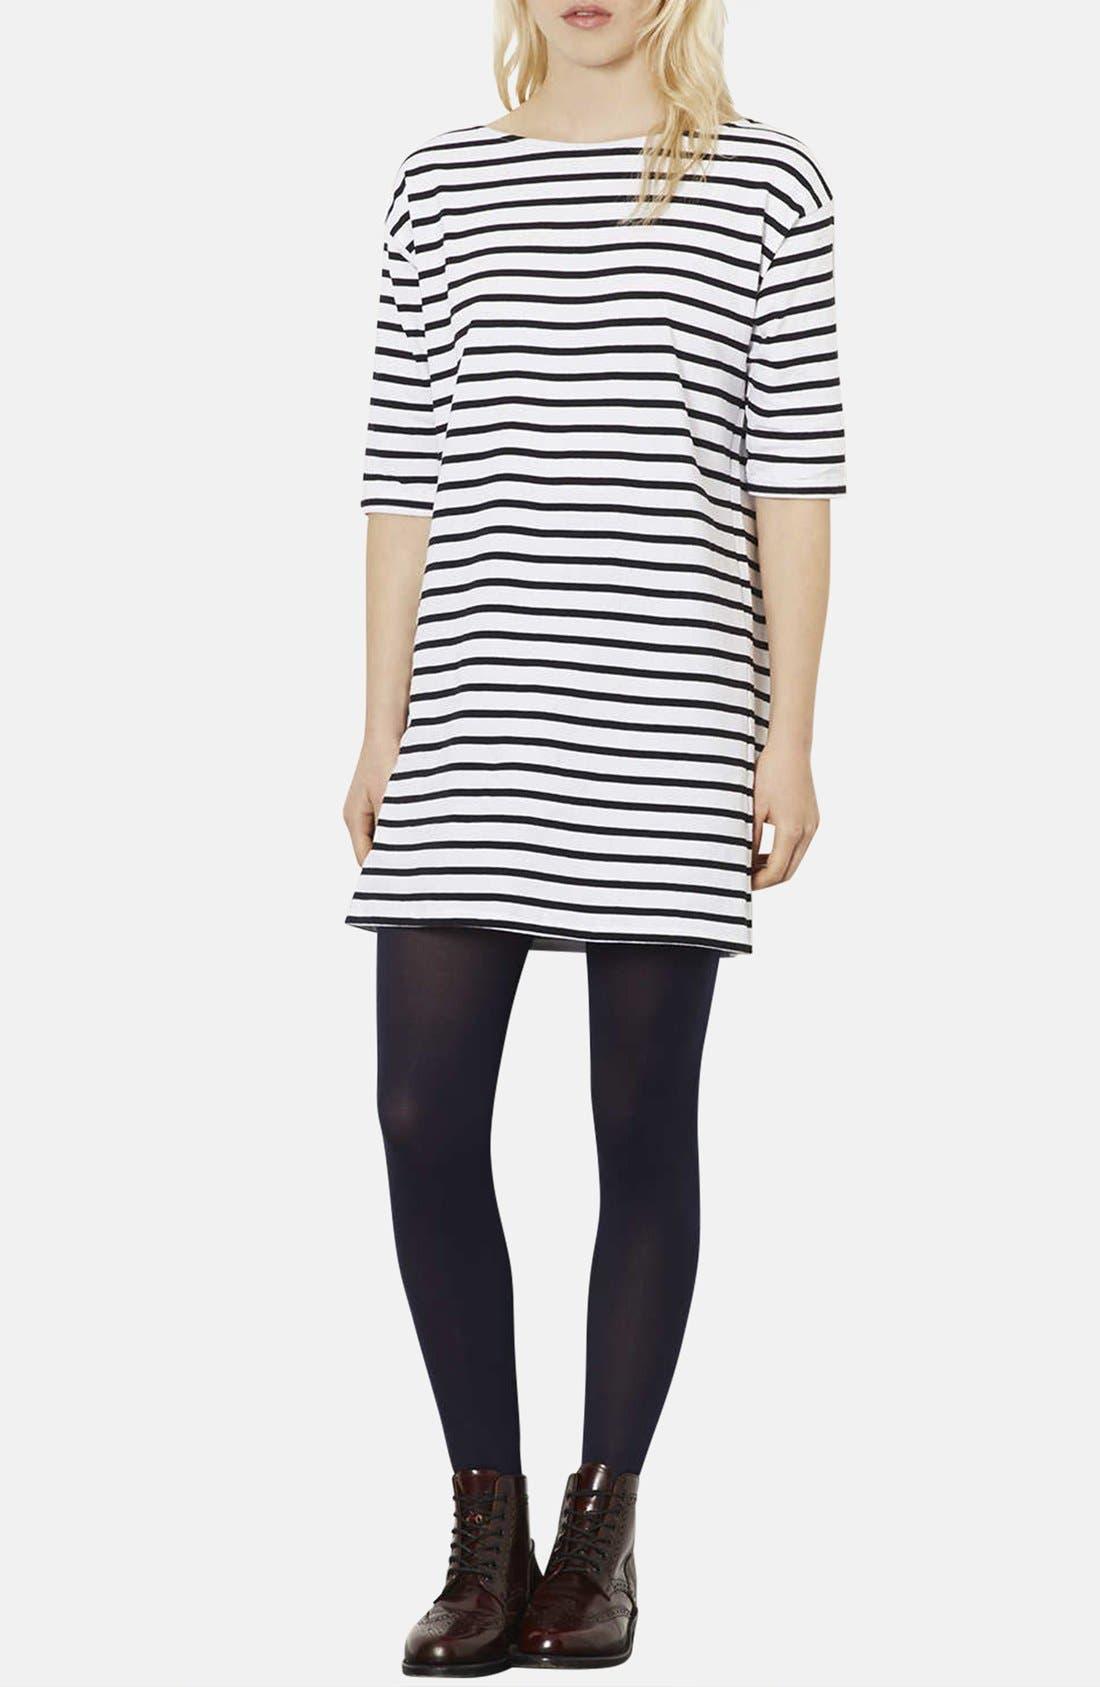 Alternate Image 1 Selected - Topshop Stripe Cotton Tunic Dress